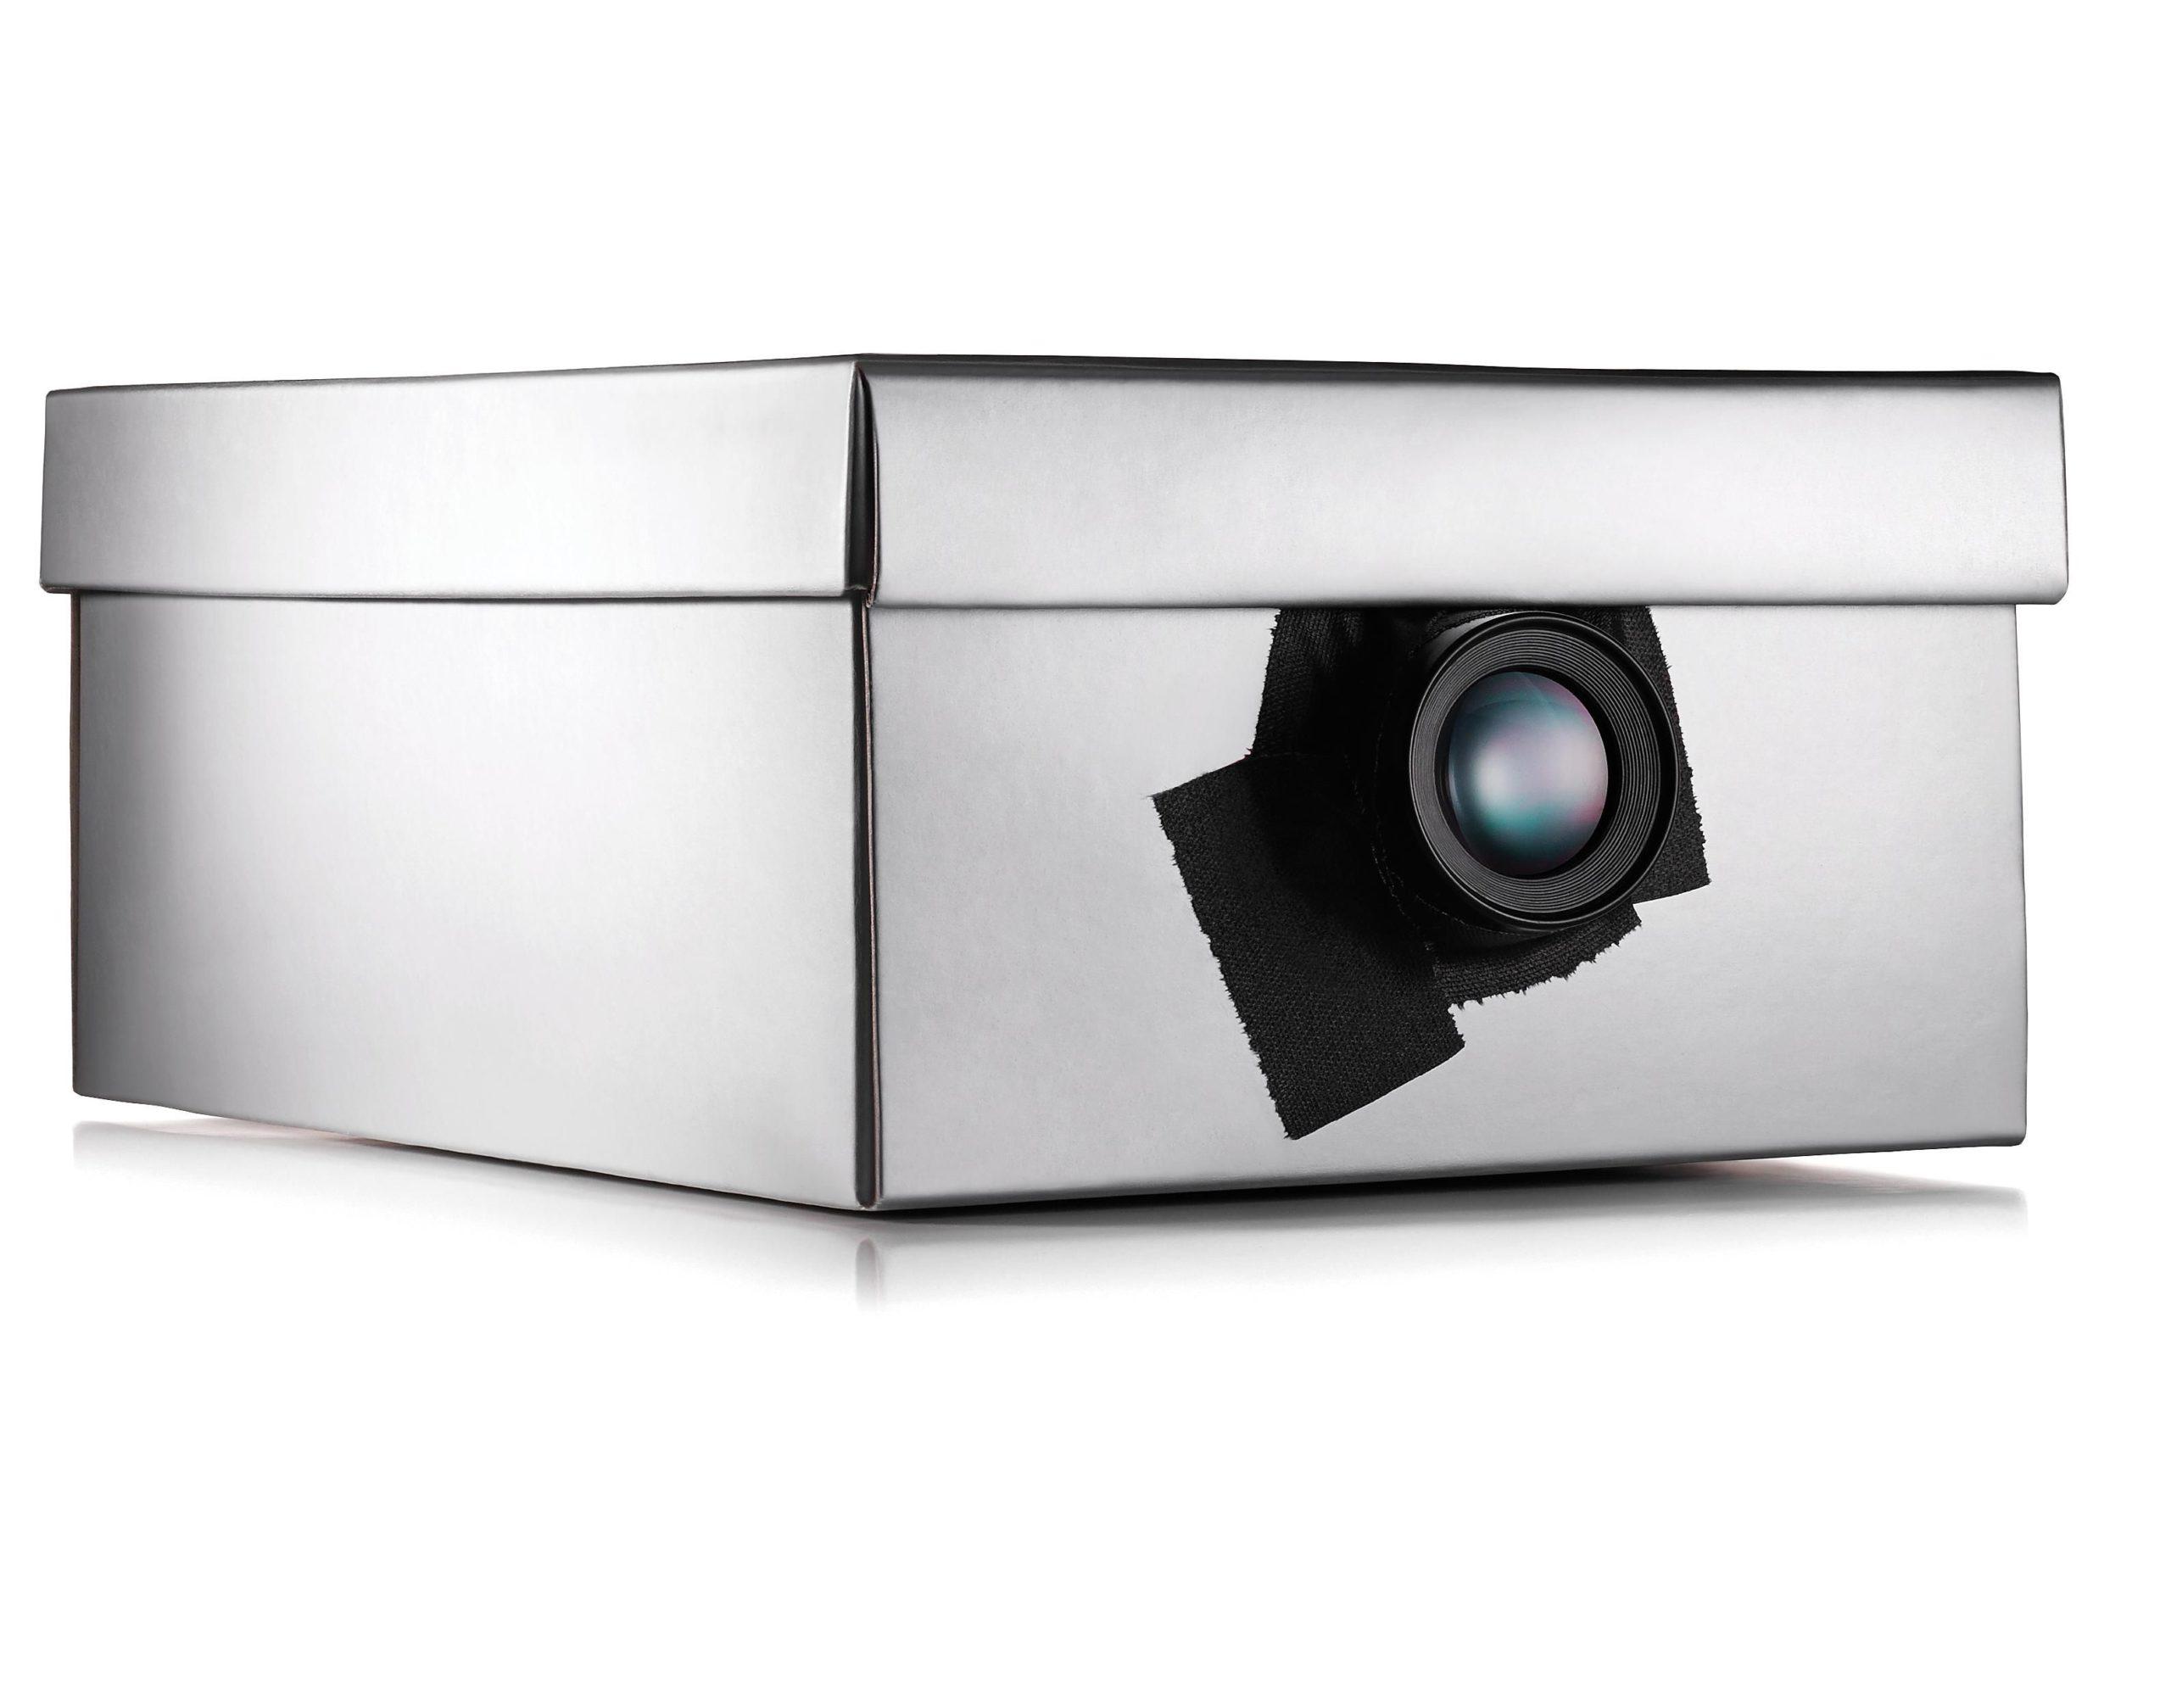 Shoe Box-Phone Projector